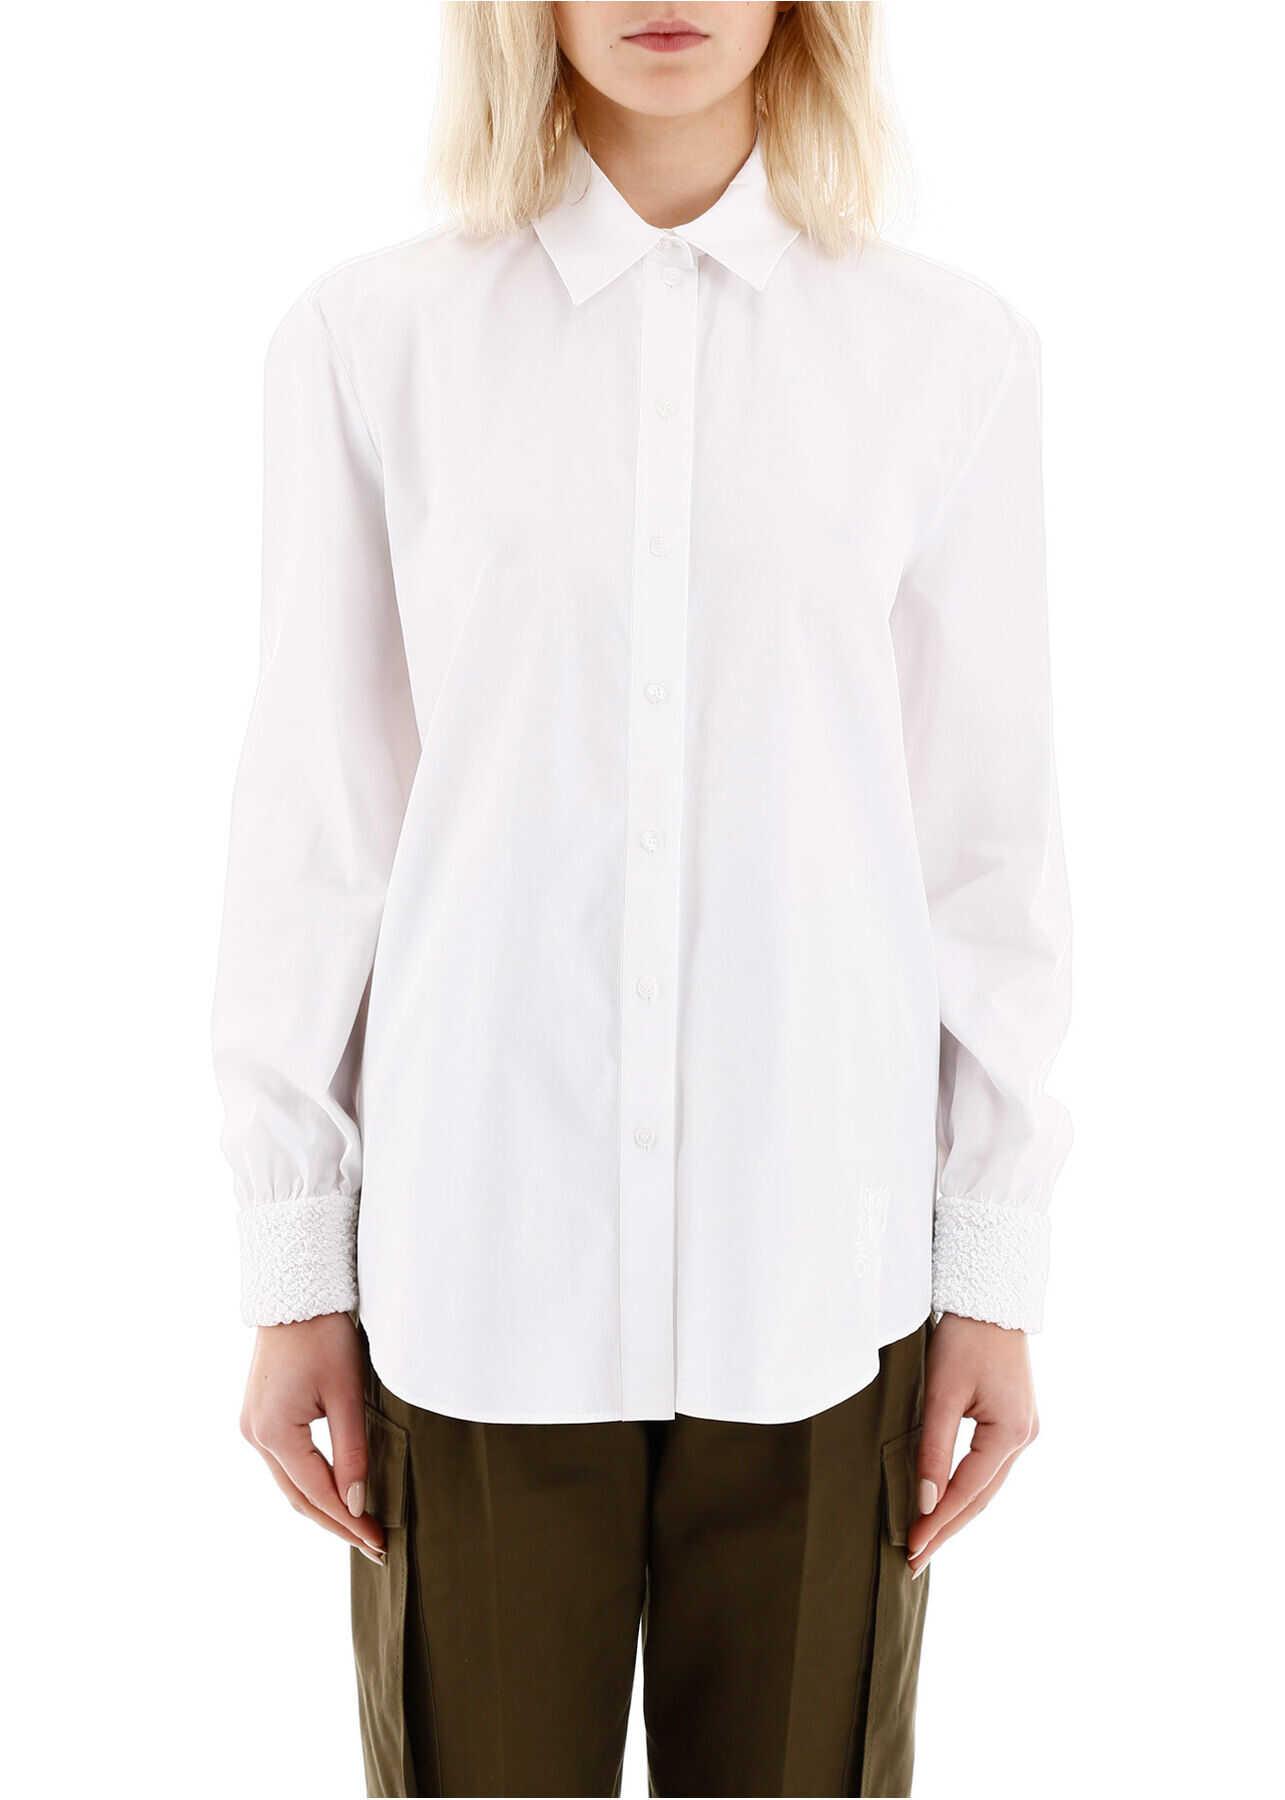 Kenzo Shirt With Smocked Cuffs FA52CH0195AP BLANC image0